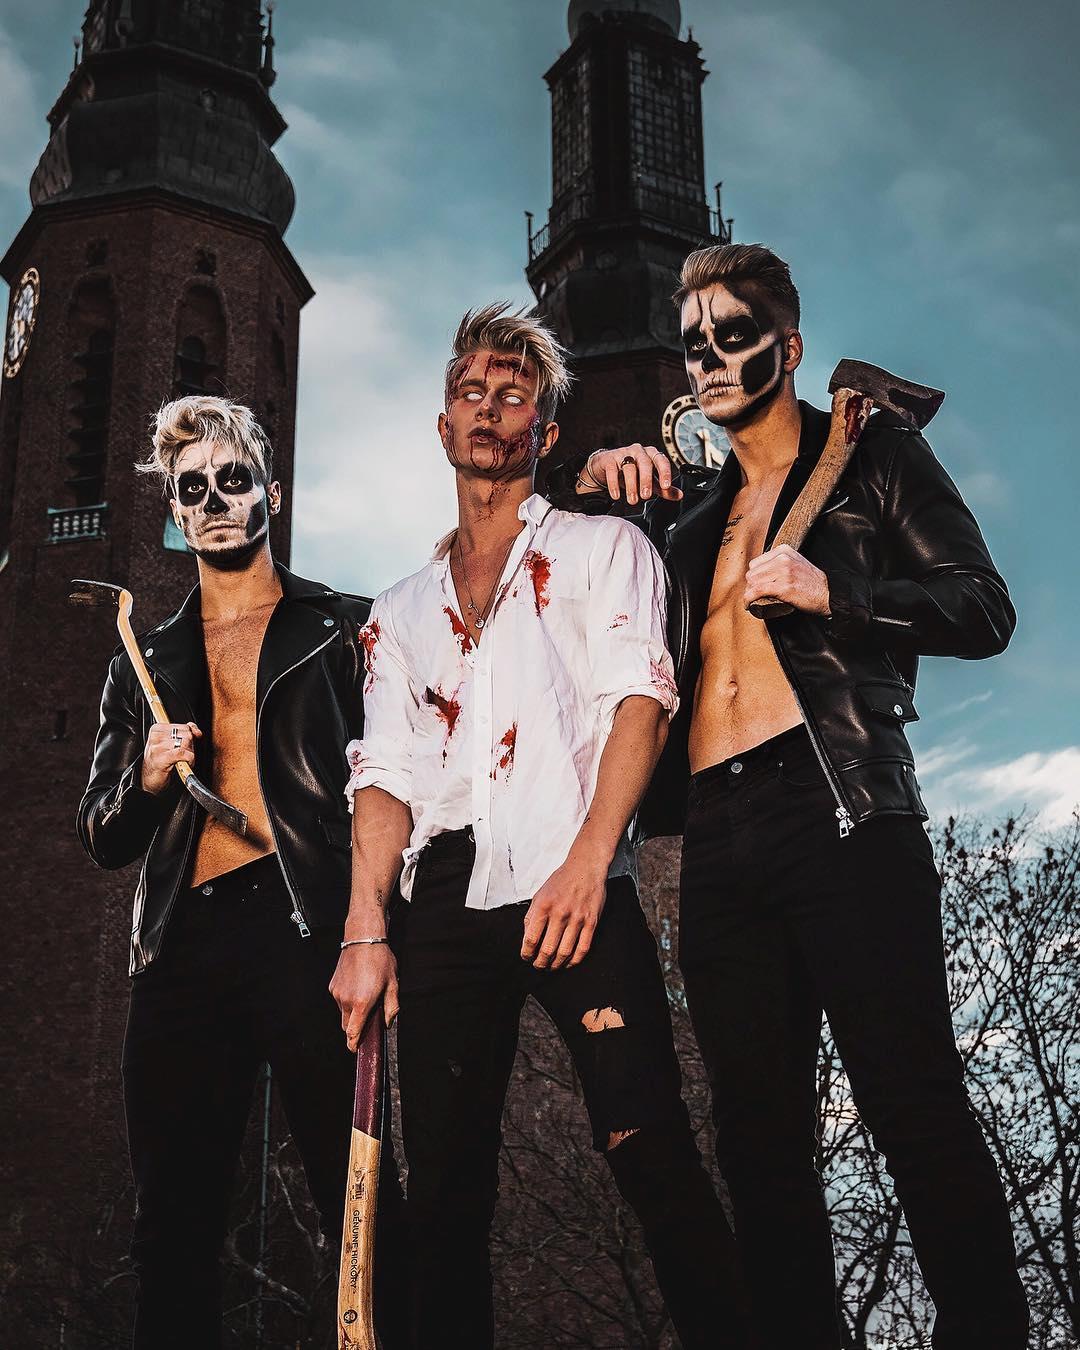 Spooky Killers for Best Halloween Costumes For Men